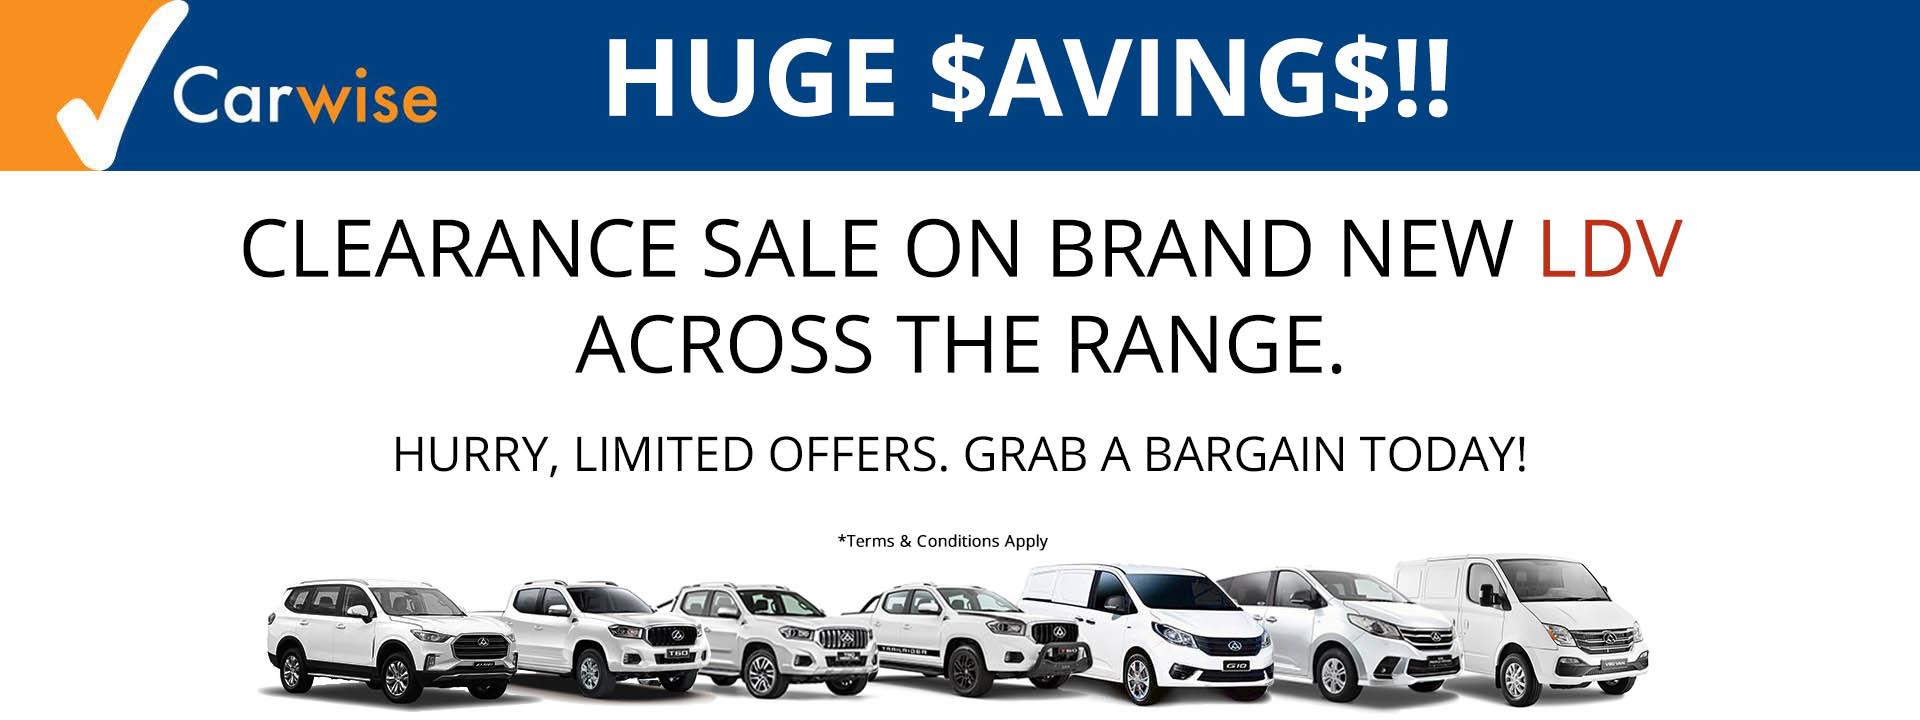 Carwise LDV Clearance Sale